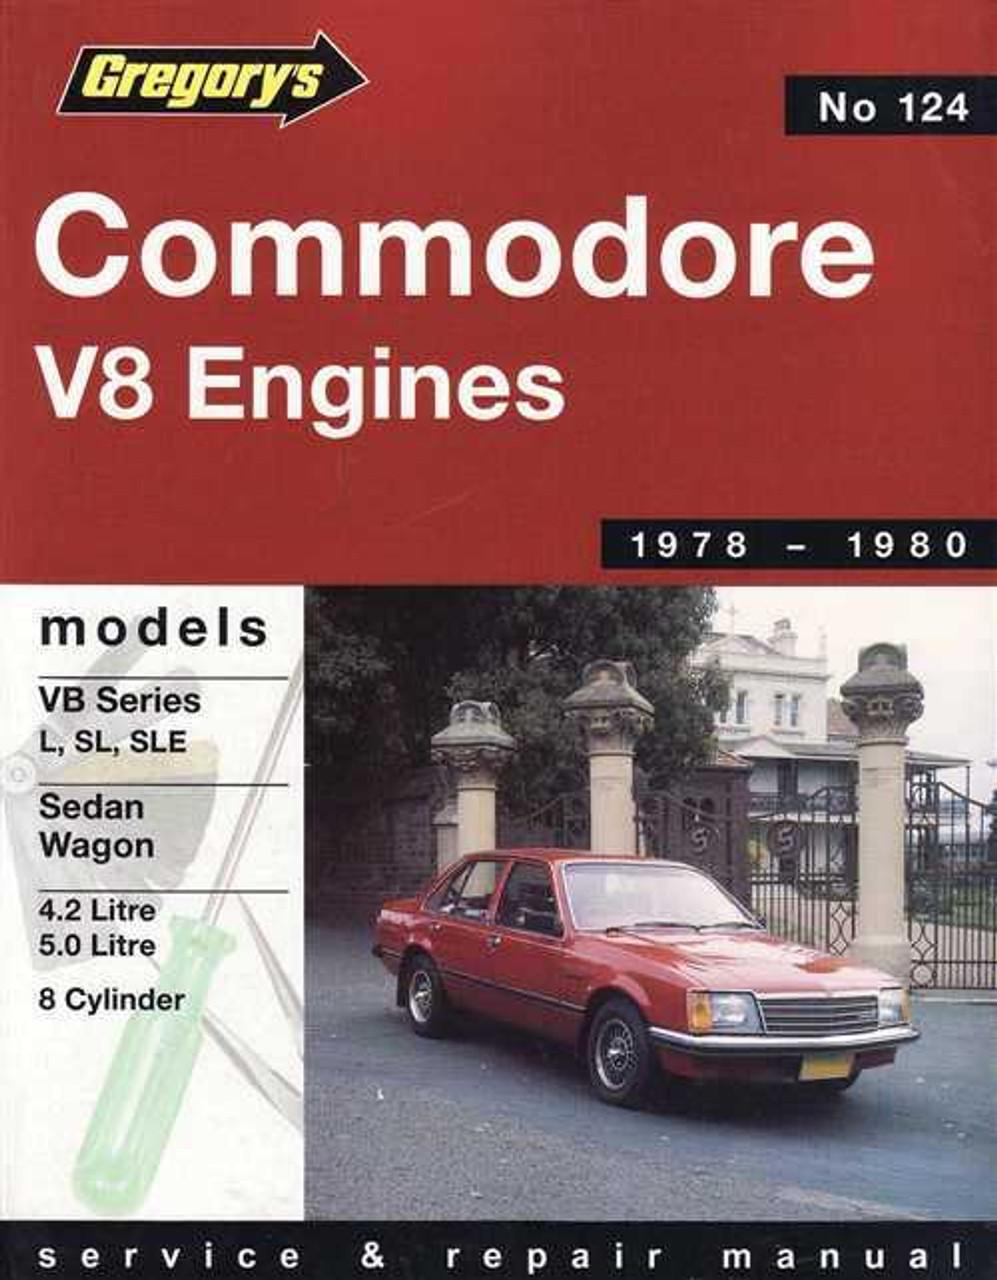 holden commodore vb series l sl sle v8 engines 1978 1980 rh automotobookshop com au vh commodore service manual pdf vh commodore workshop manual free download